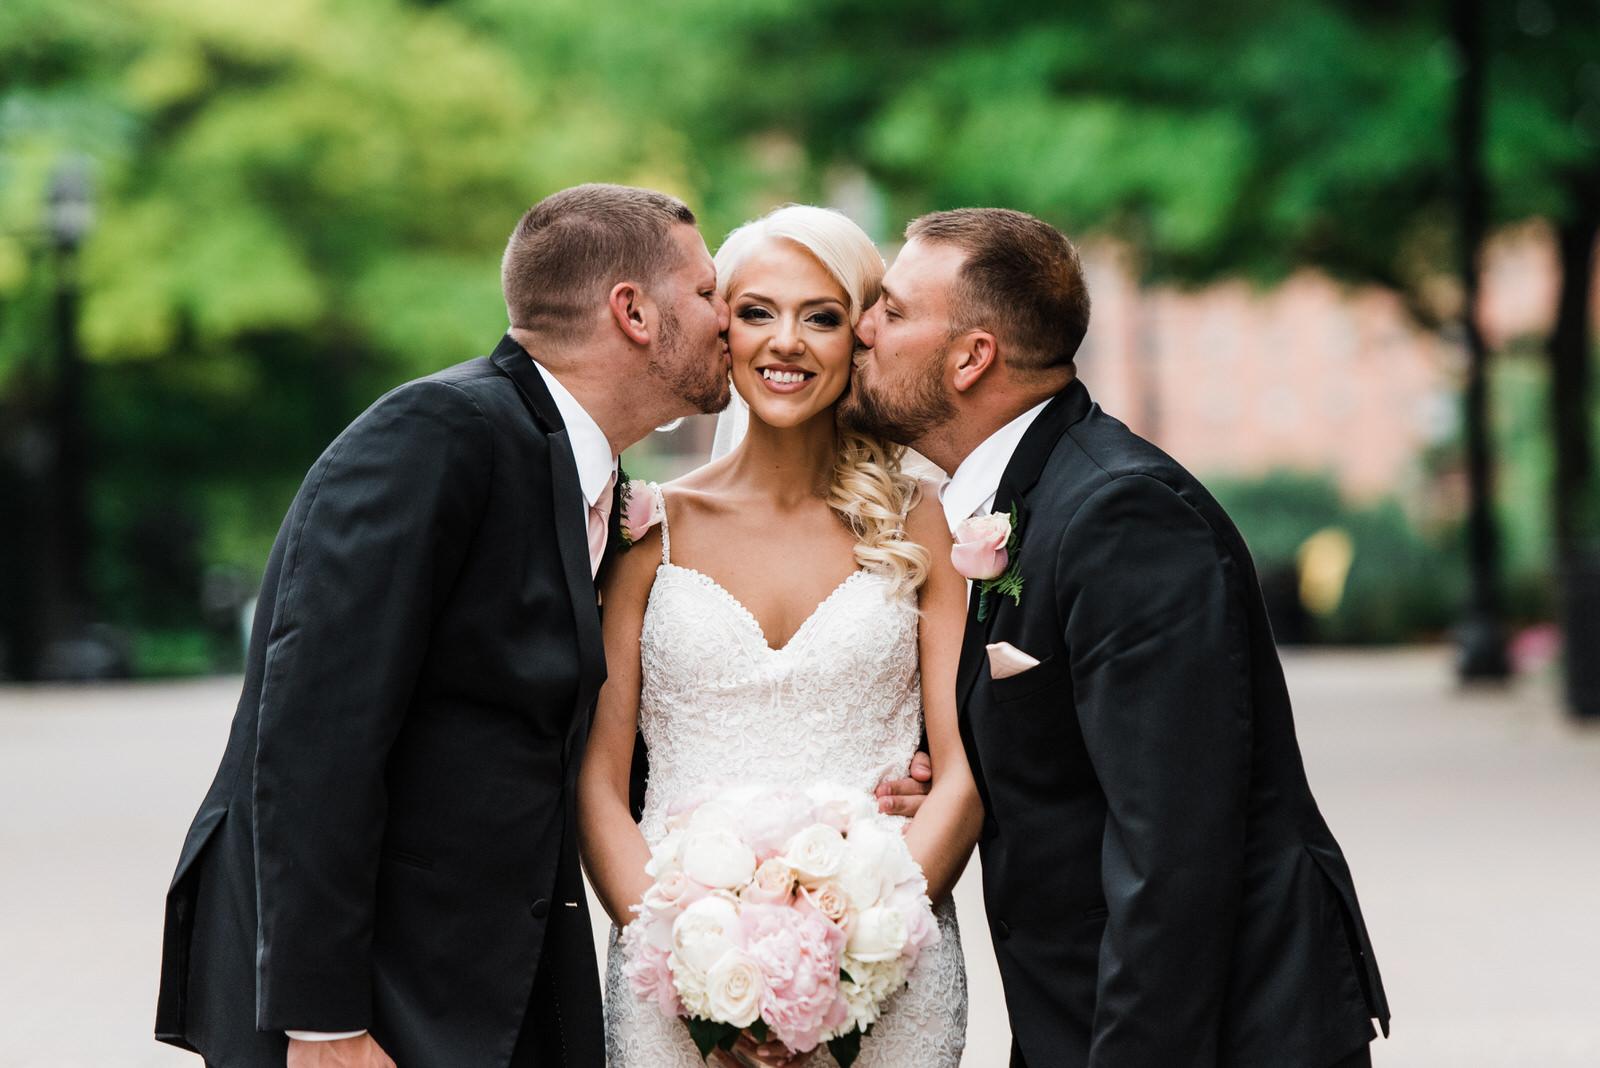 Pittsburgh-Duquesne-University-Wedding-008.jpg